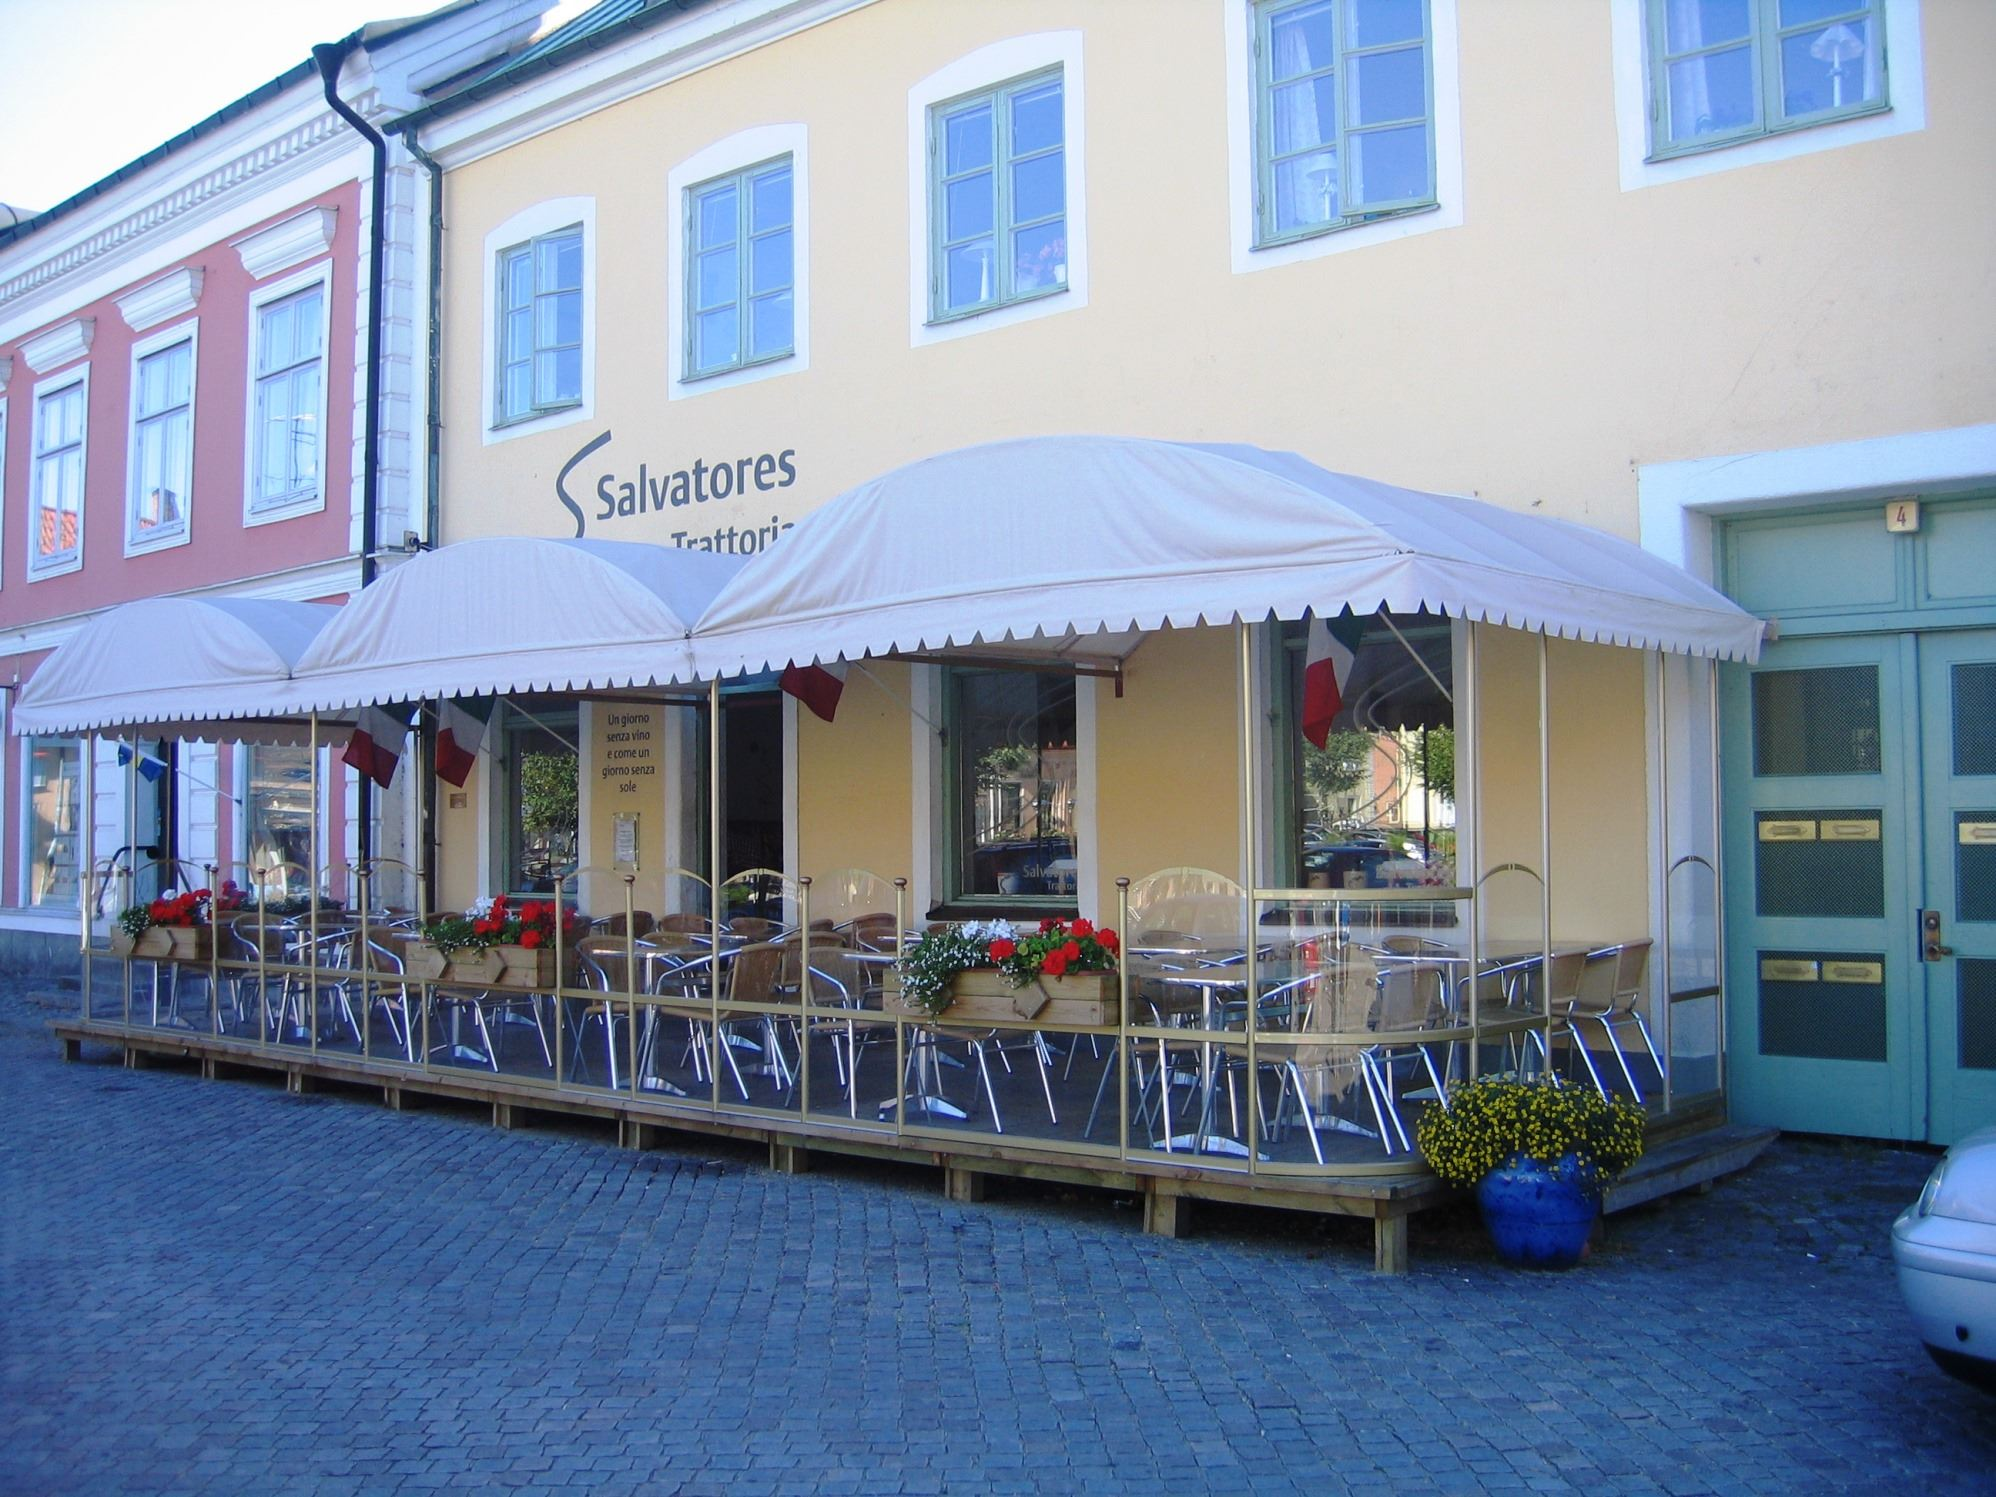 Salvatores Trattoria - Sölvesborg